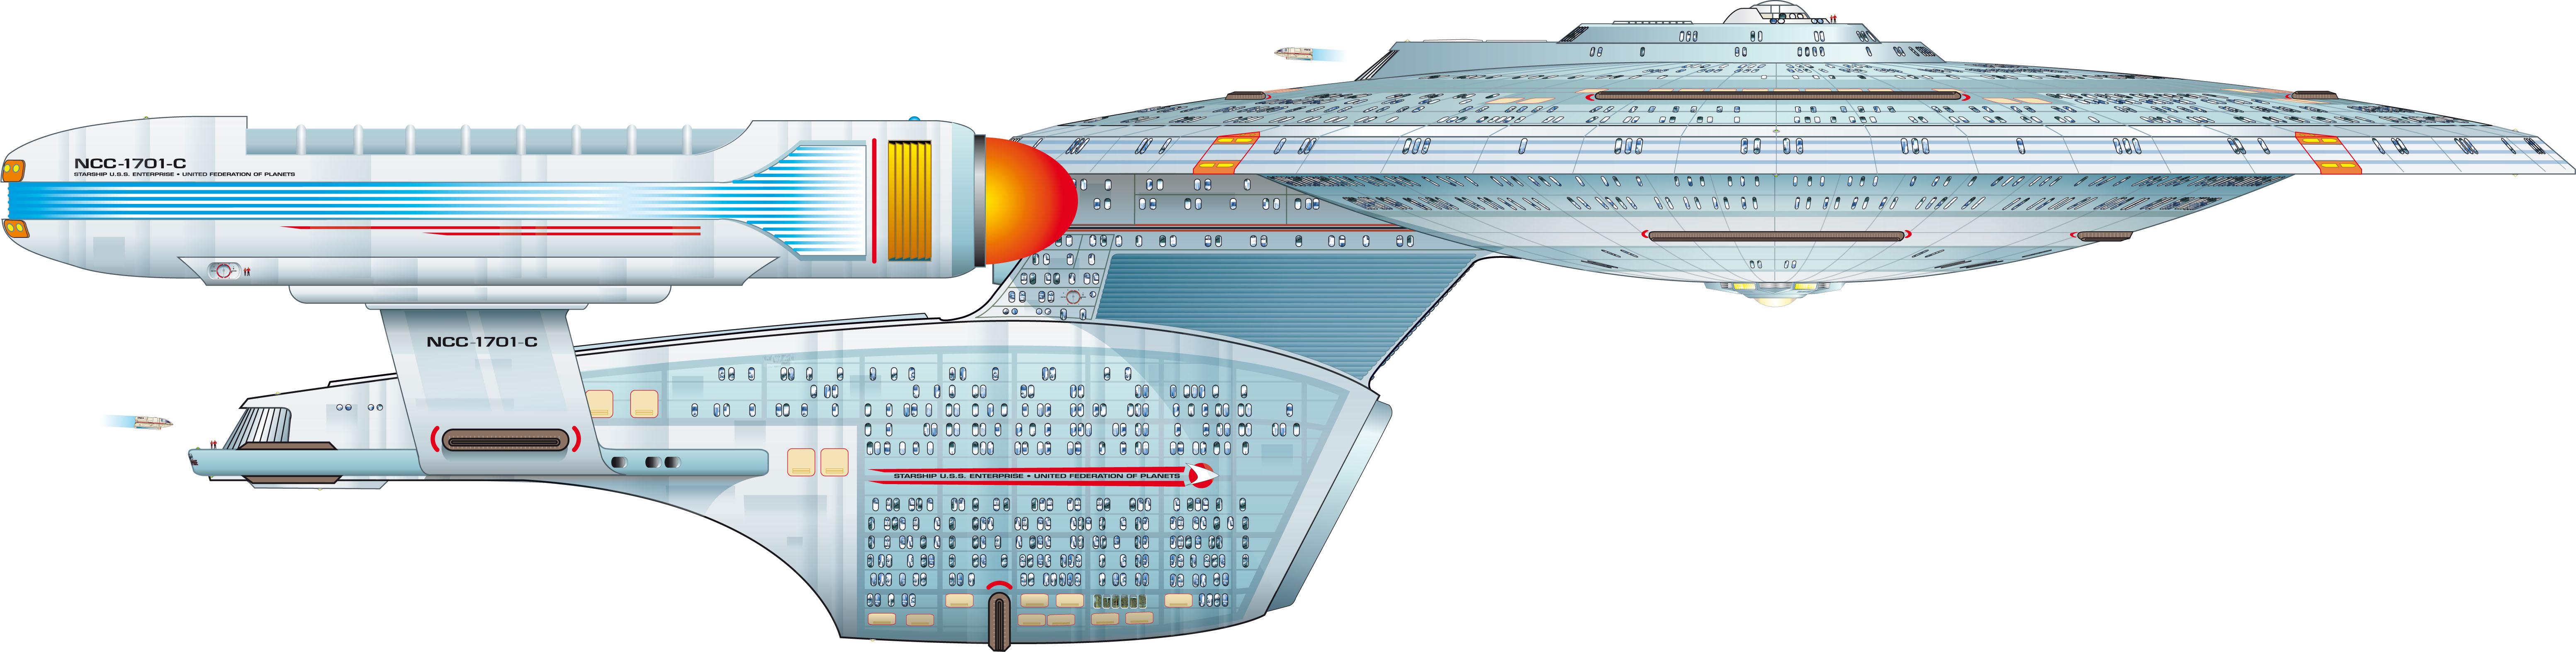 yamaha royal star 1300 wiring diagram yamaha v